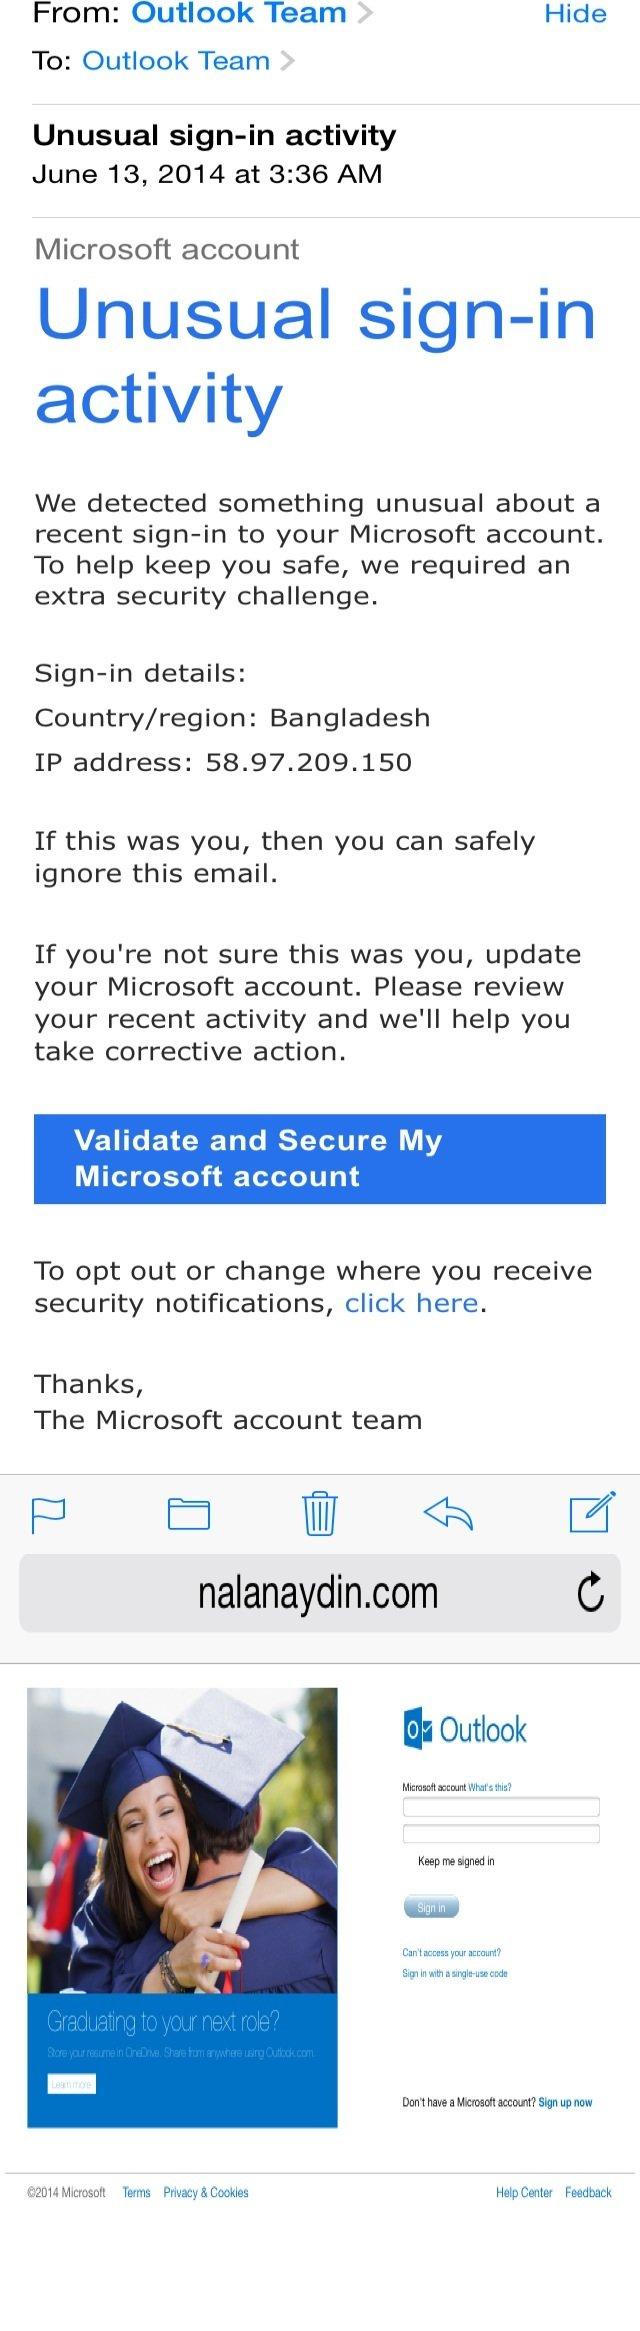 Microsoft Validation Request #Spam #theft